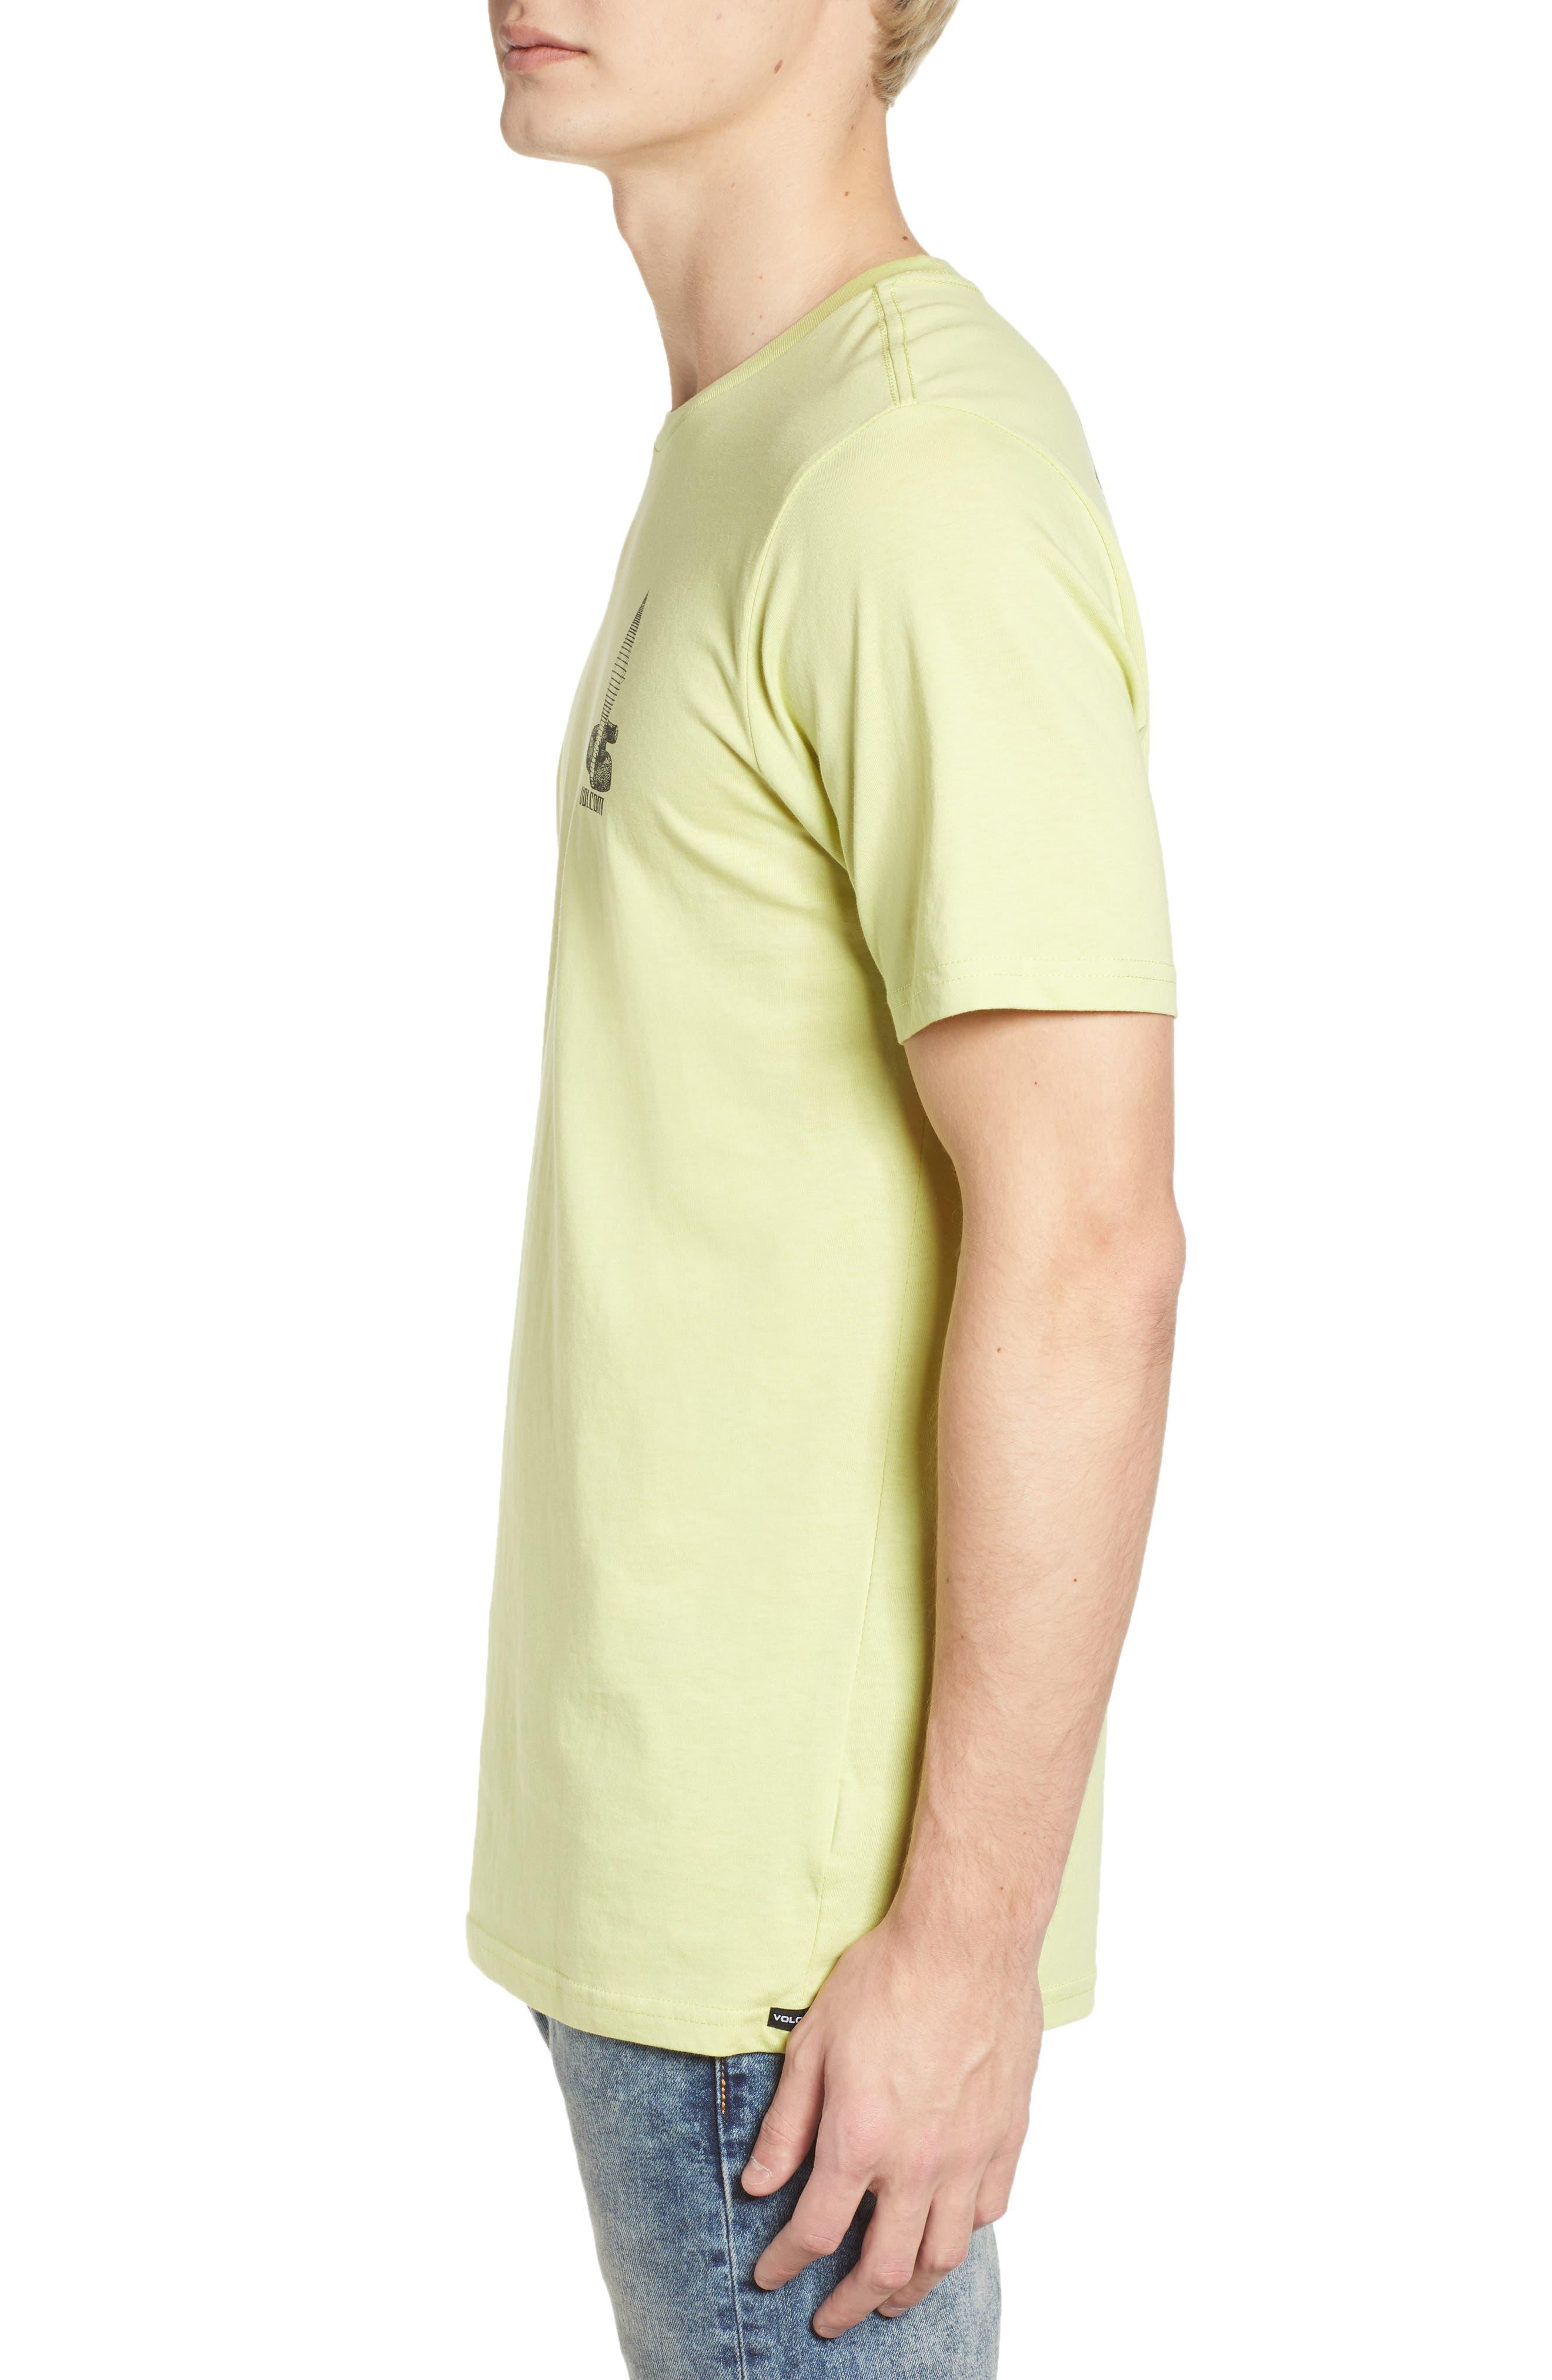 Digital Poison Graphic T-Shirt,                             Alternate thumbnail 3, color,                             Lime